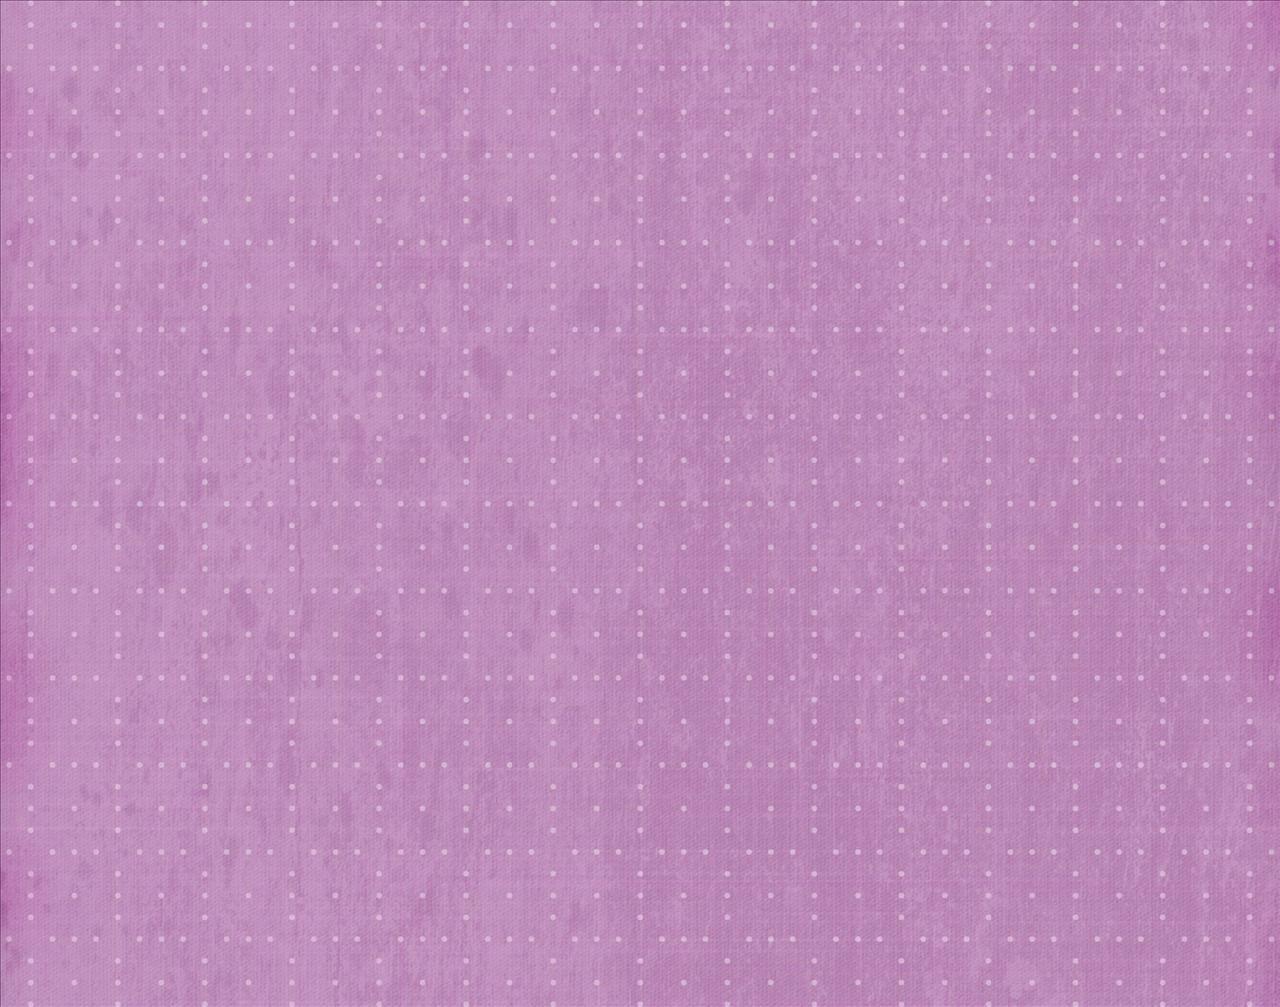 Light Purple Backgrounds - Wallpaper Cave